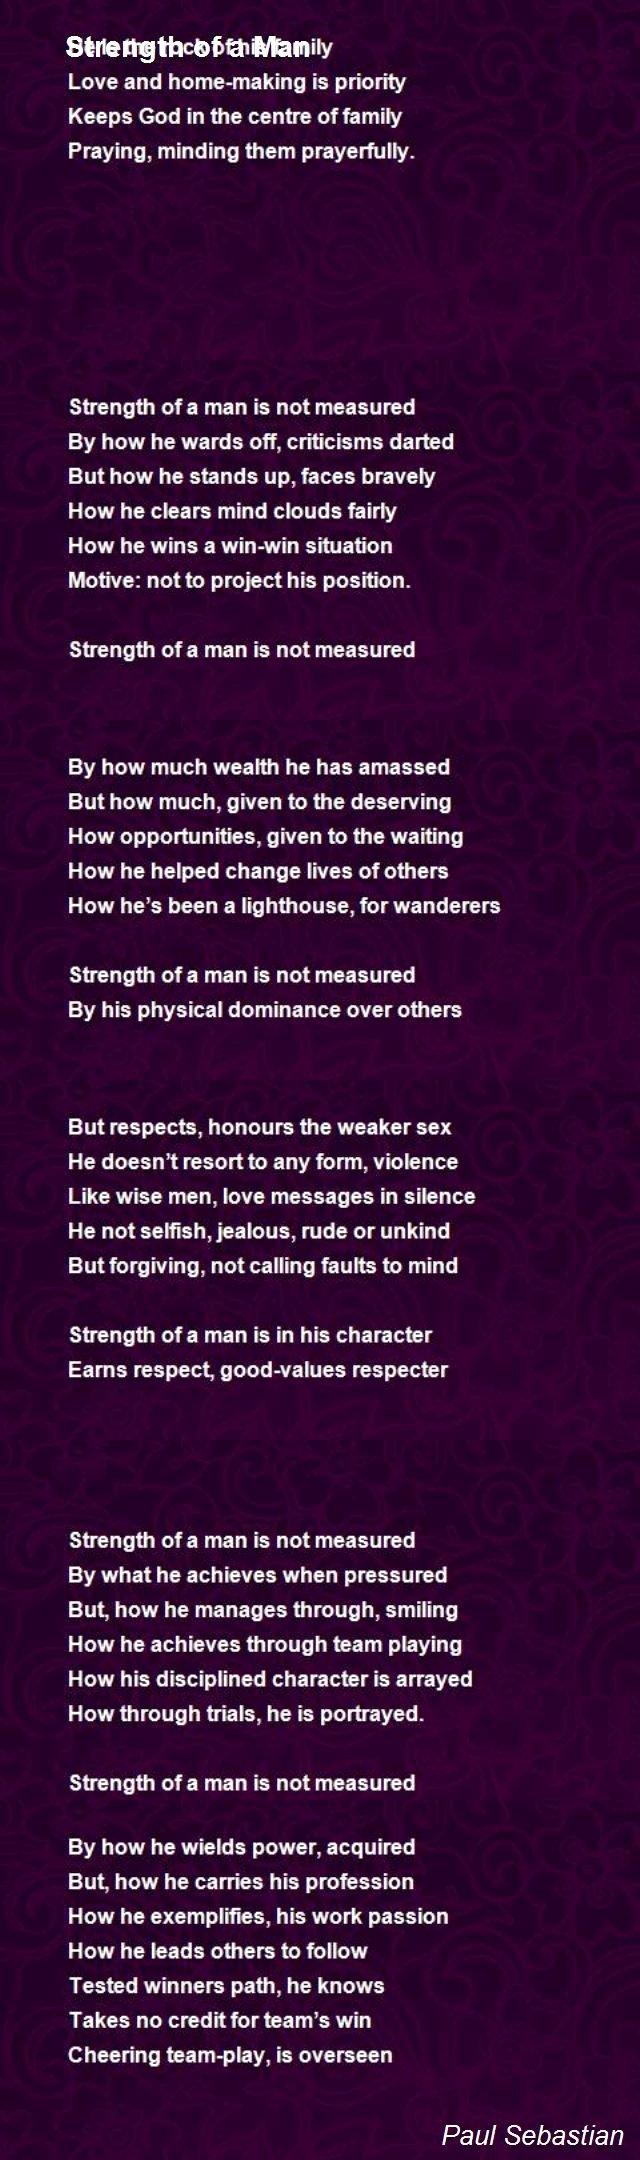 Love Poems Of Great Men New Strength A Man Poem by Paul Sebastian Poem Hunter